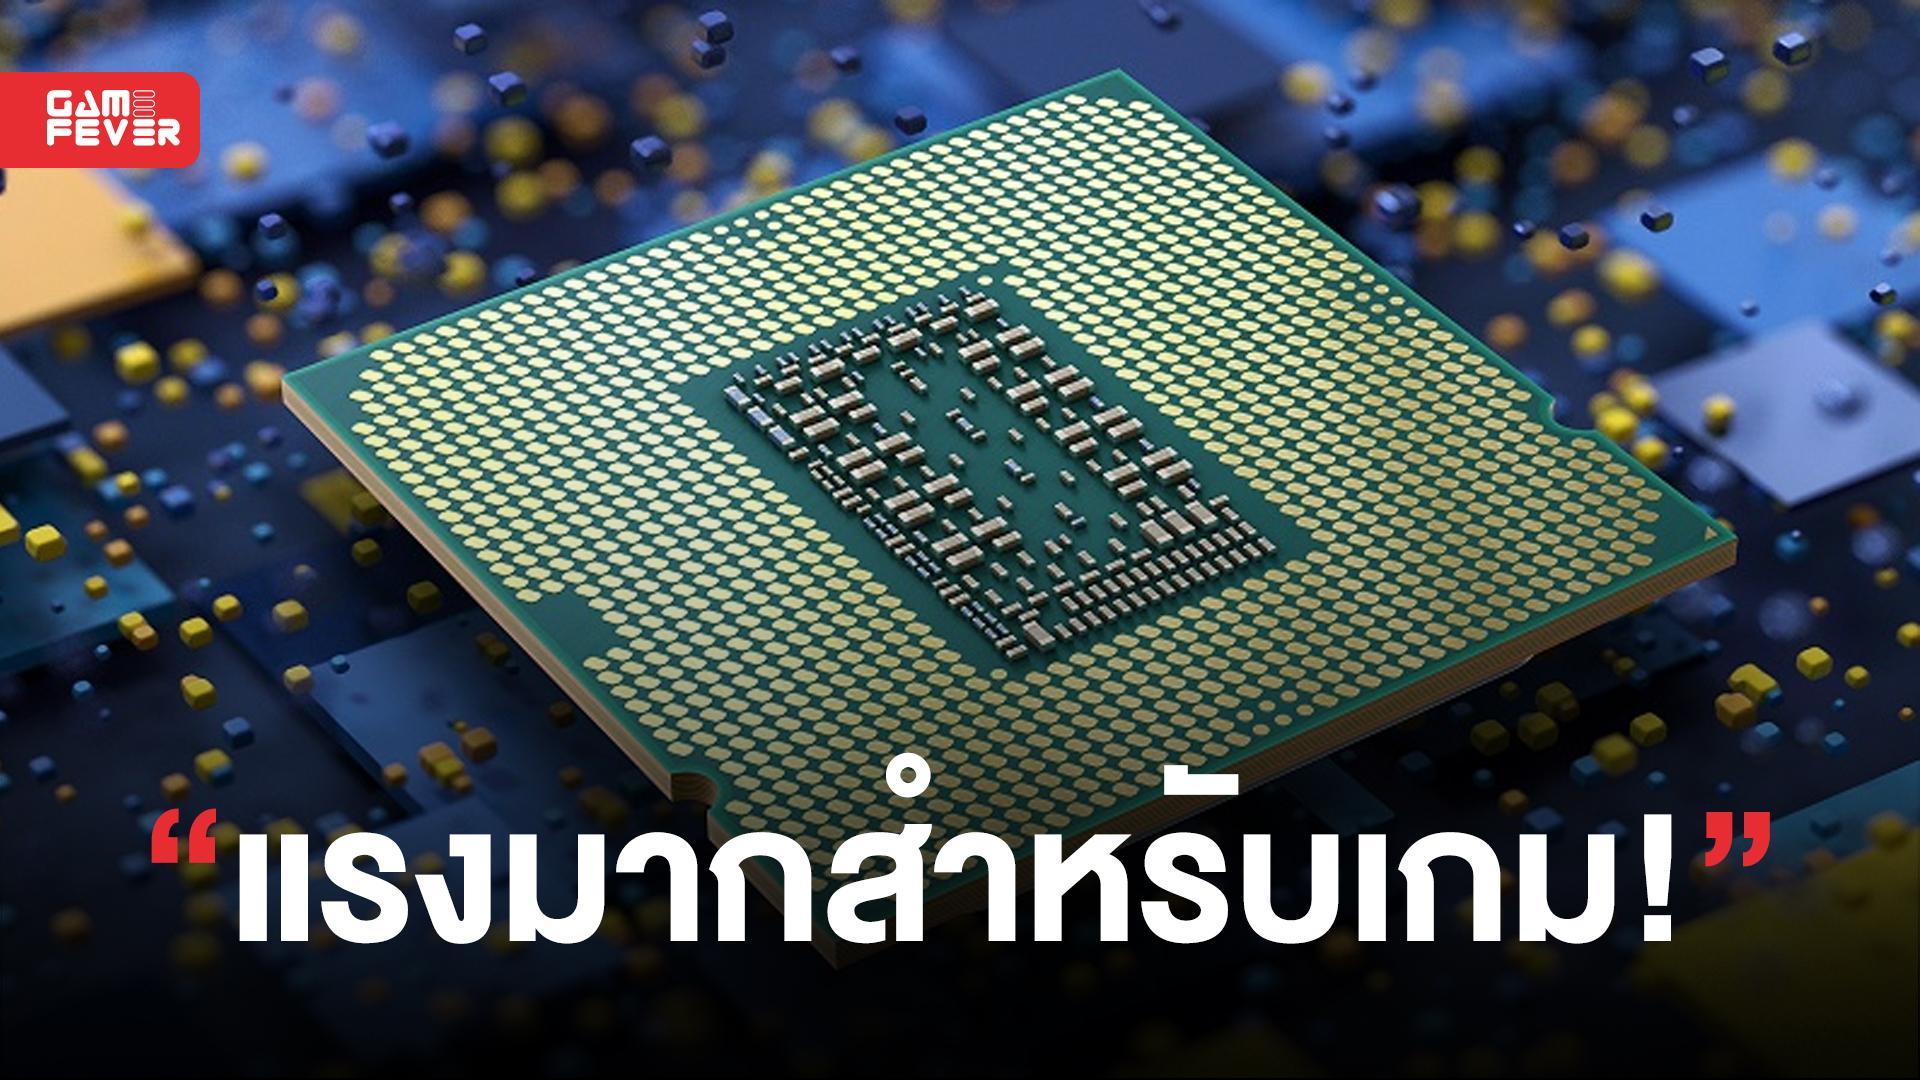 i9-12900K ทำคะแนน Single ได้ 825 บน CPU-Z แรงกว่า i9-11900K ถึง 20%